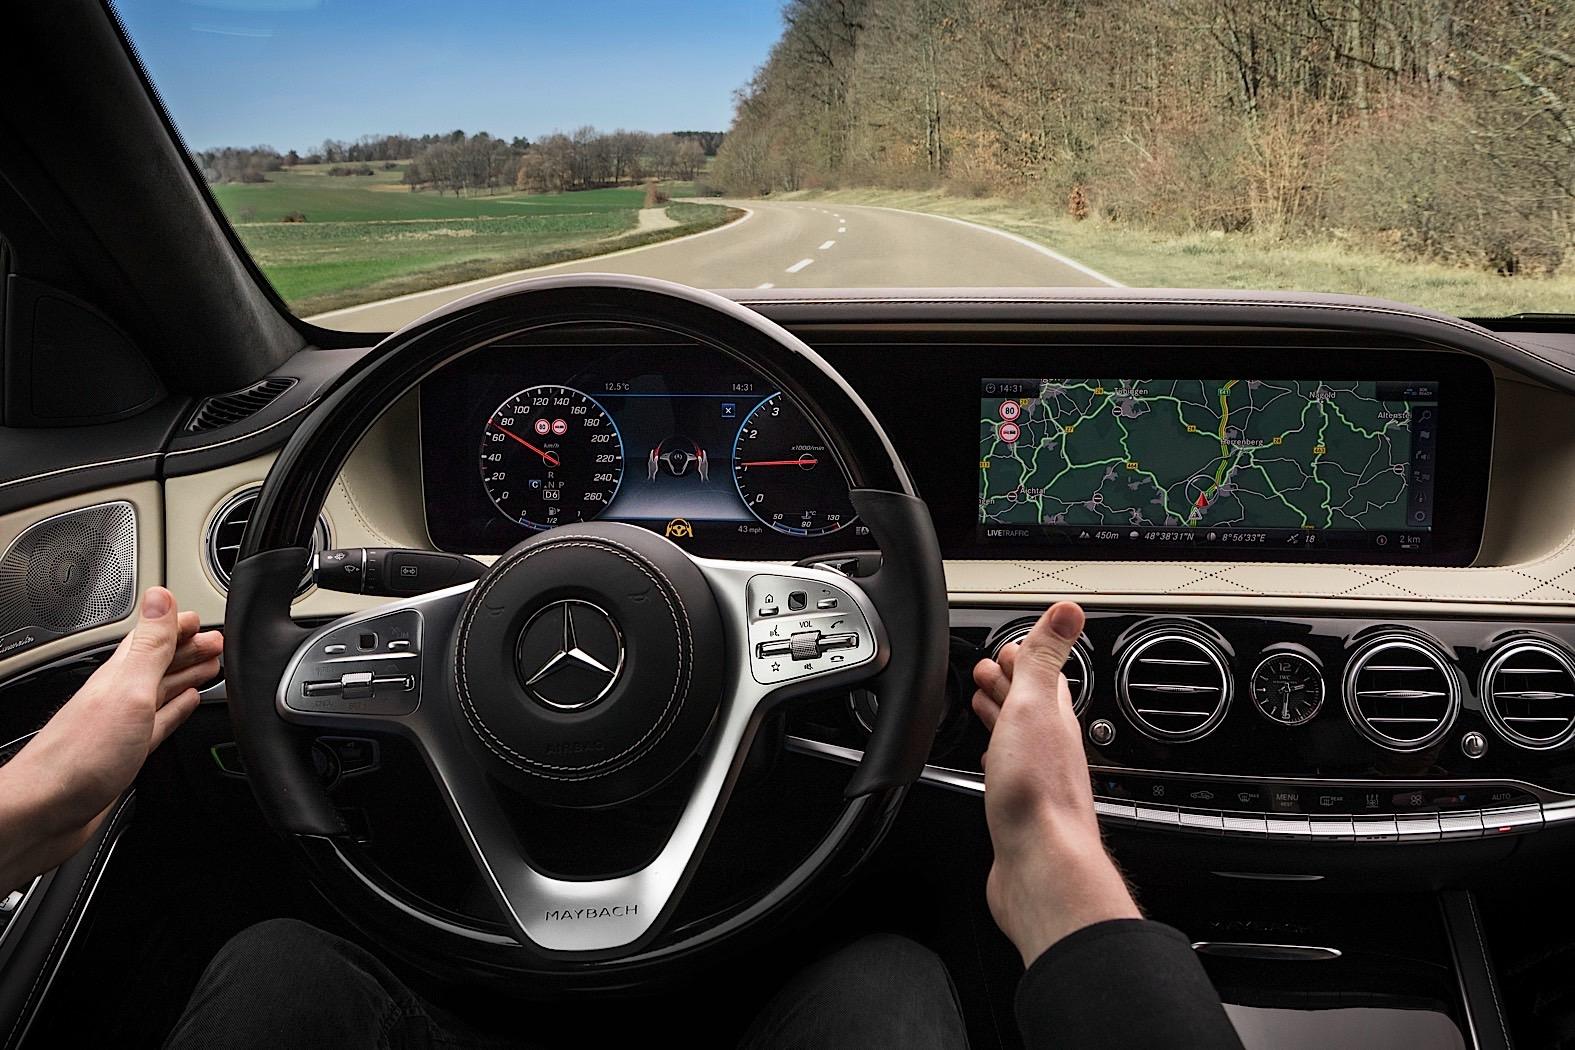 Mercedes Upgrades the S-Class With More Semi-Autonomous Capabilities